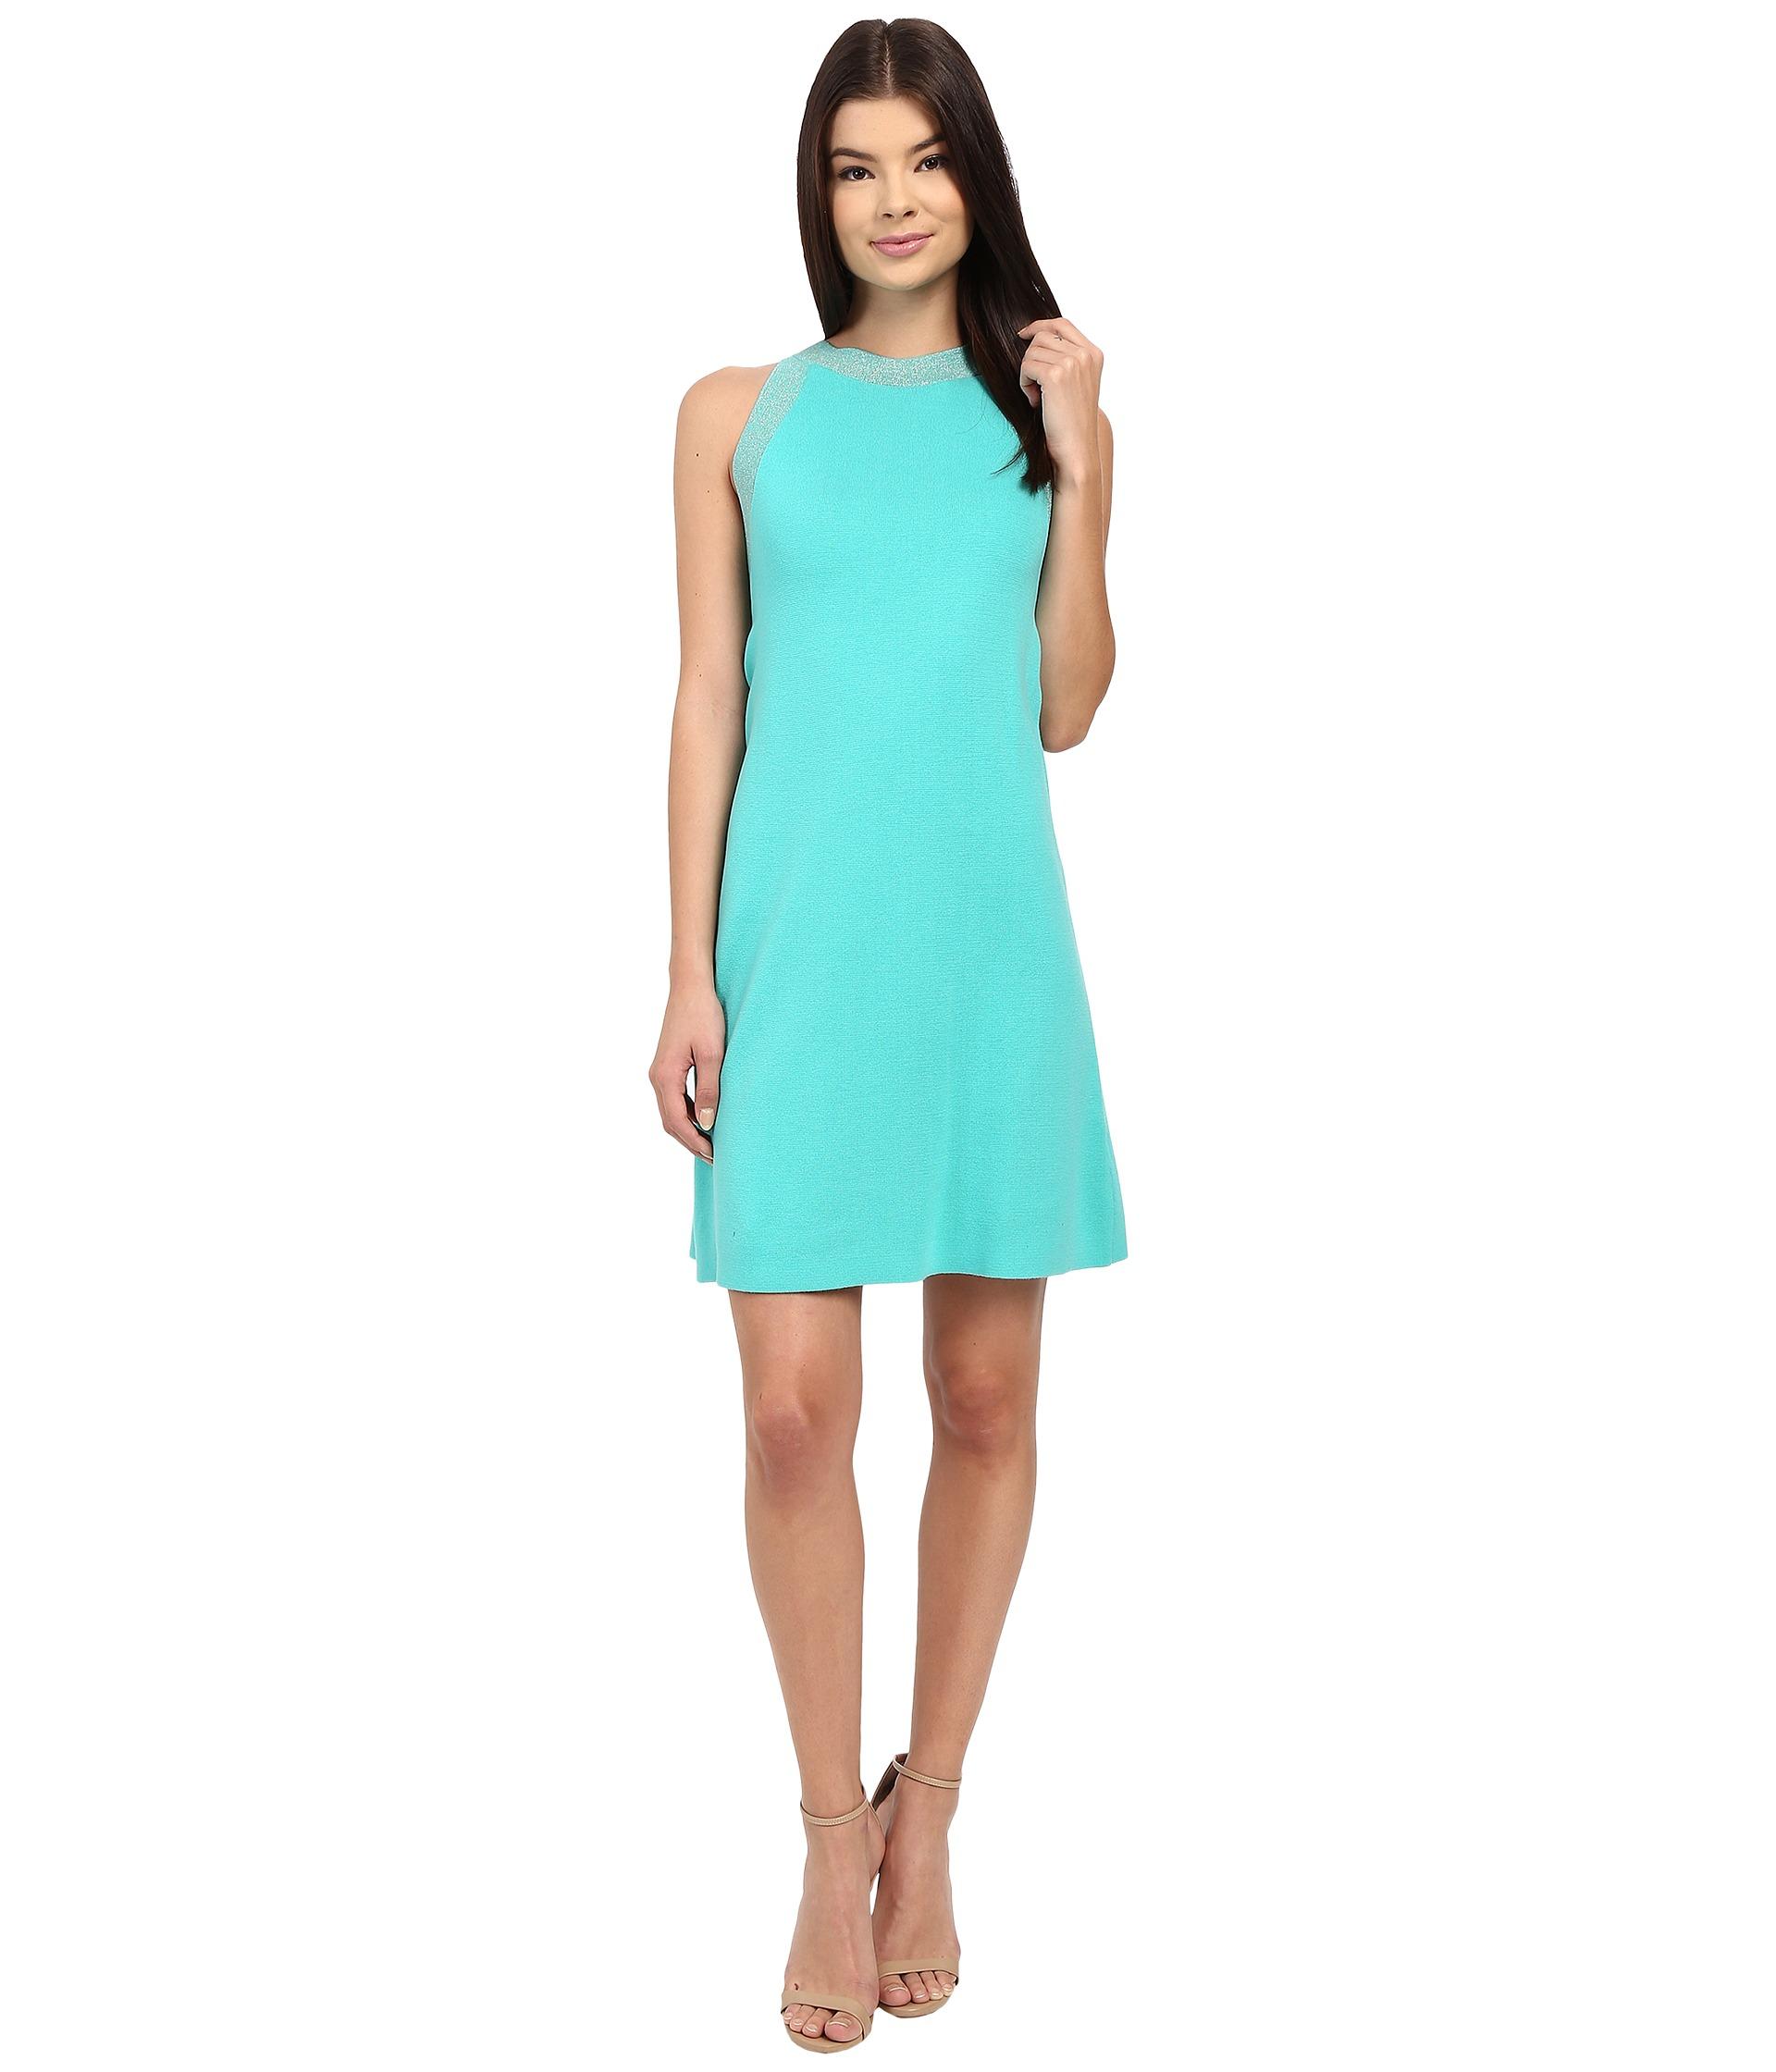 Light blue lace dress target